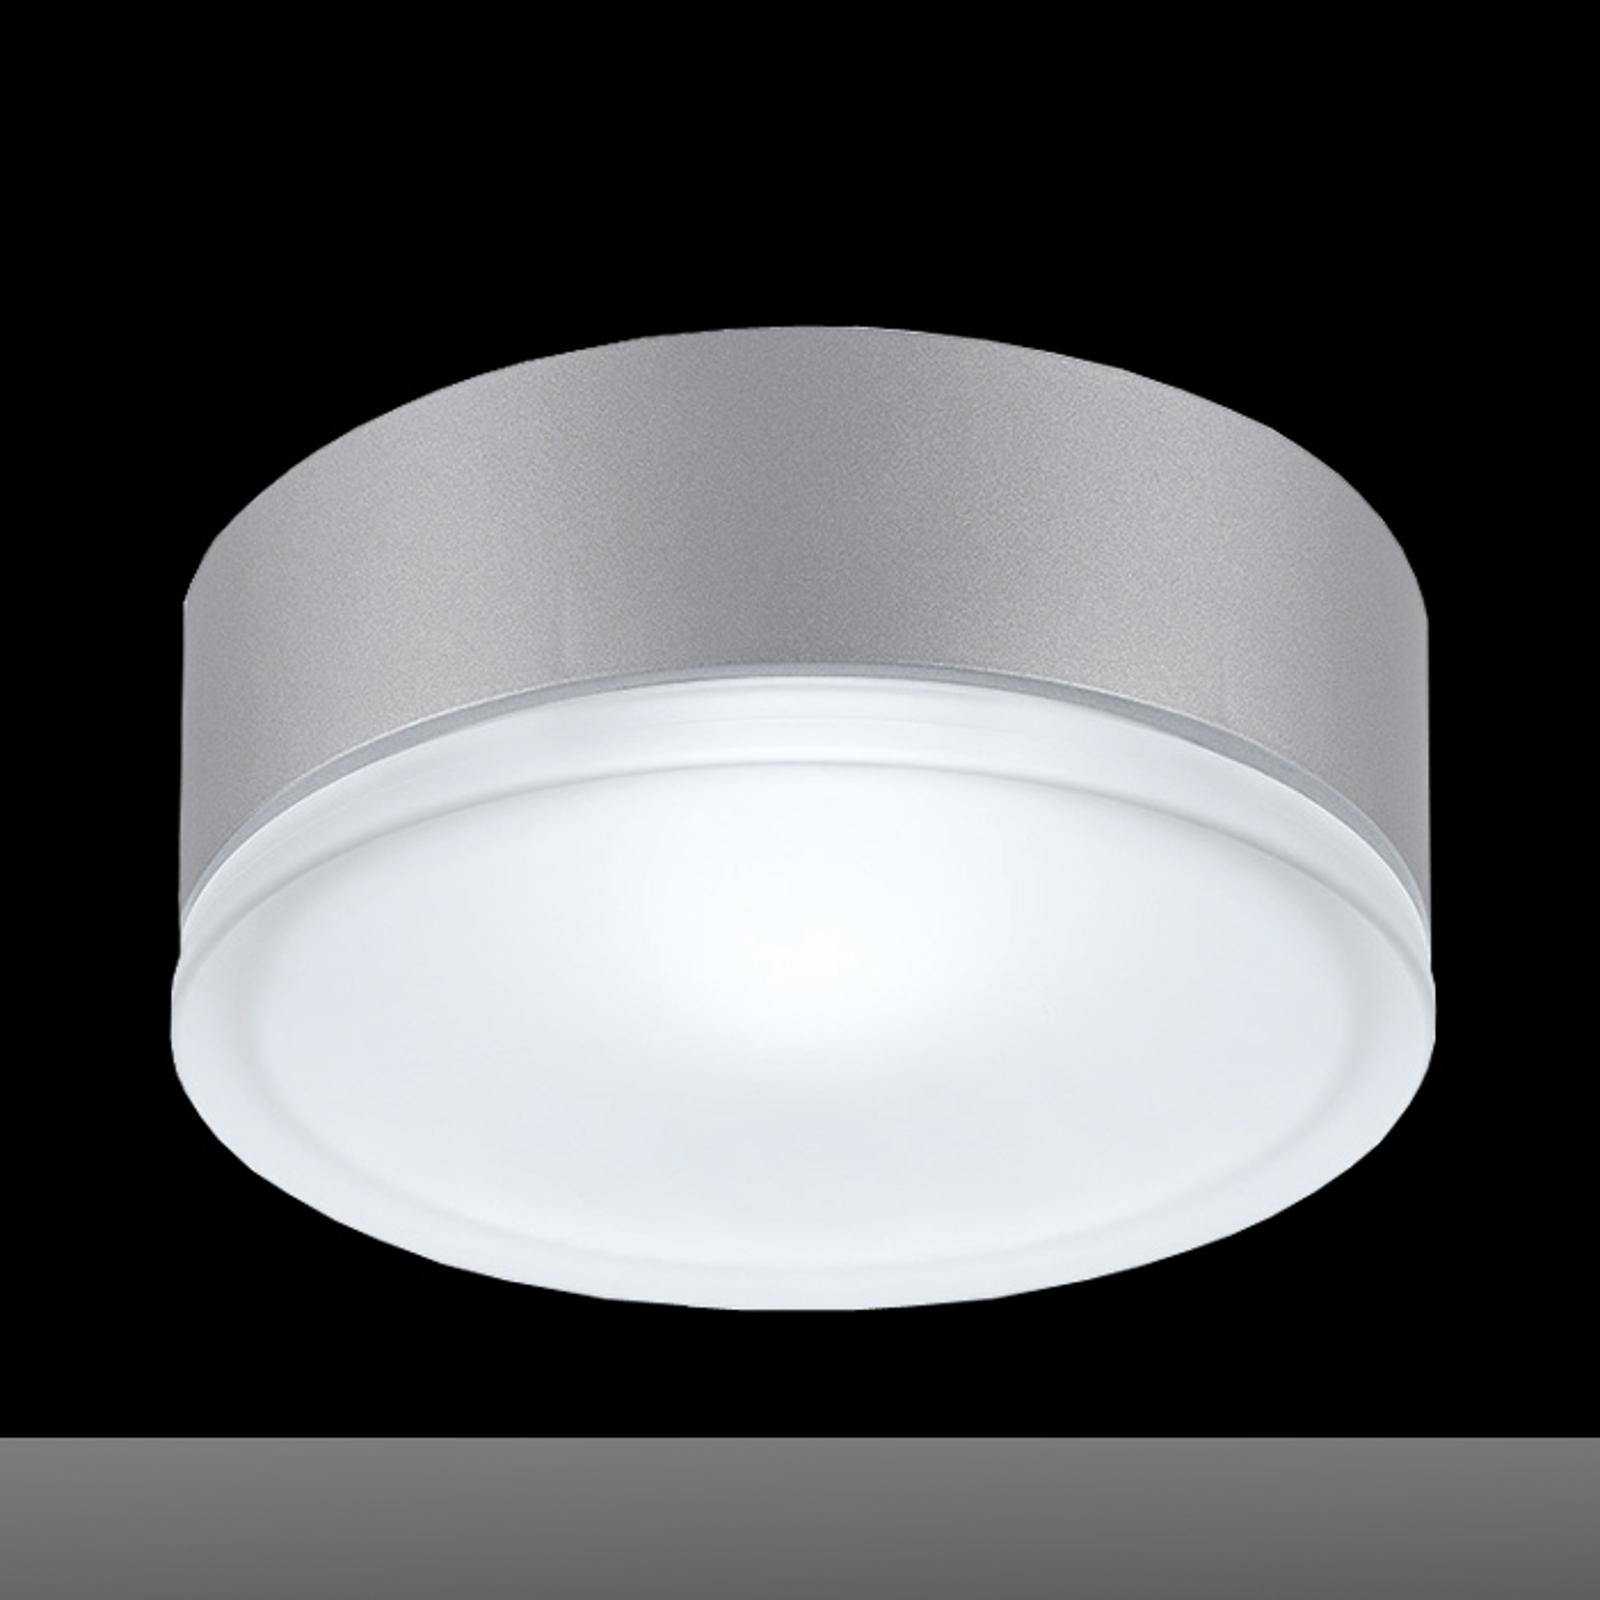 DROP 28 grote wandlamp, grijs